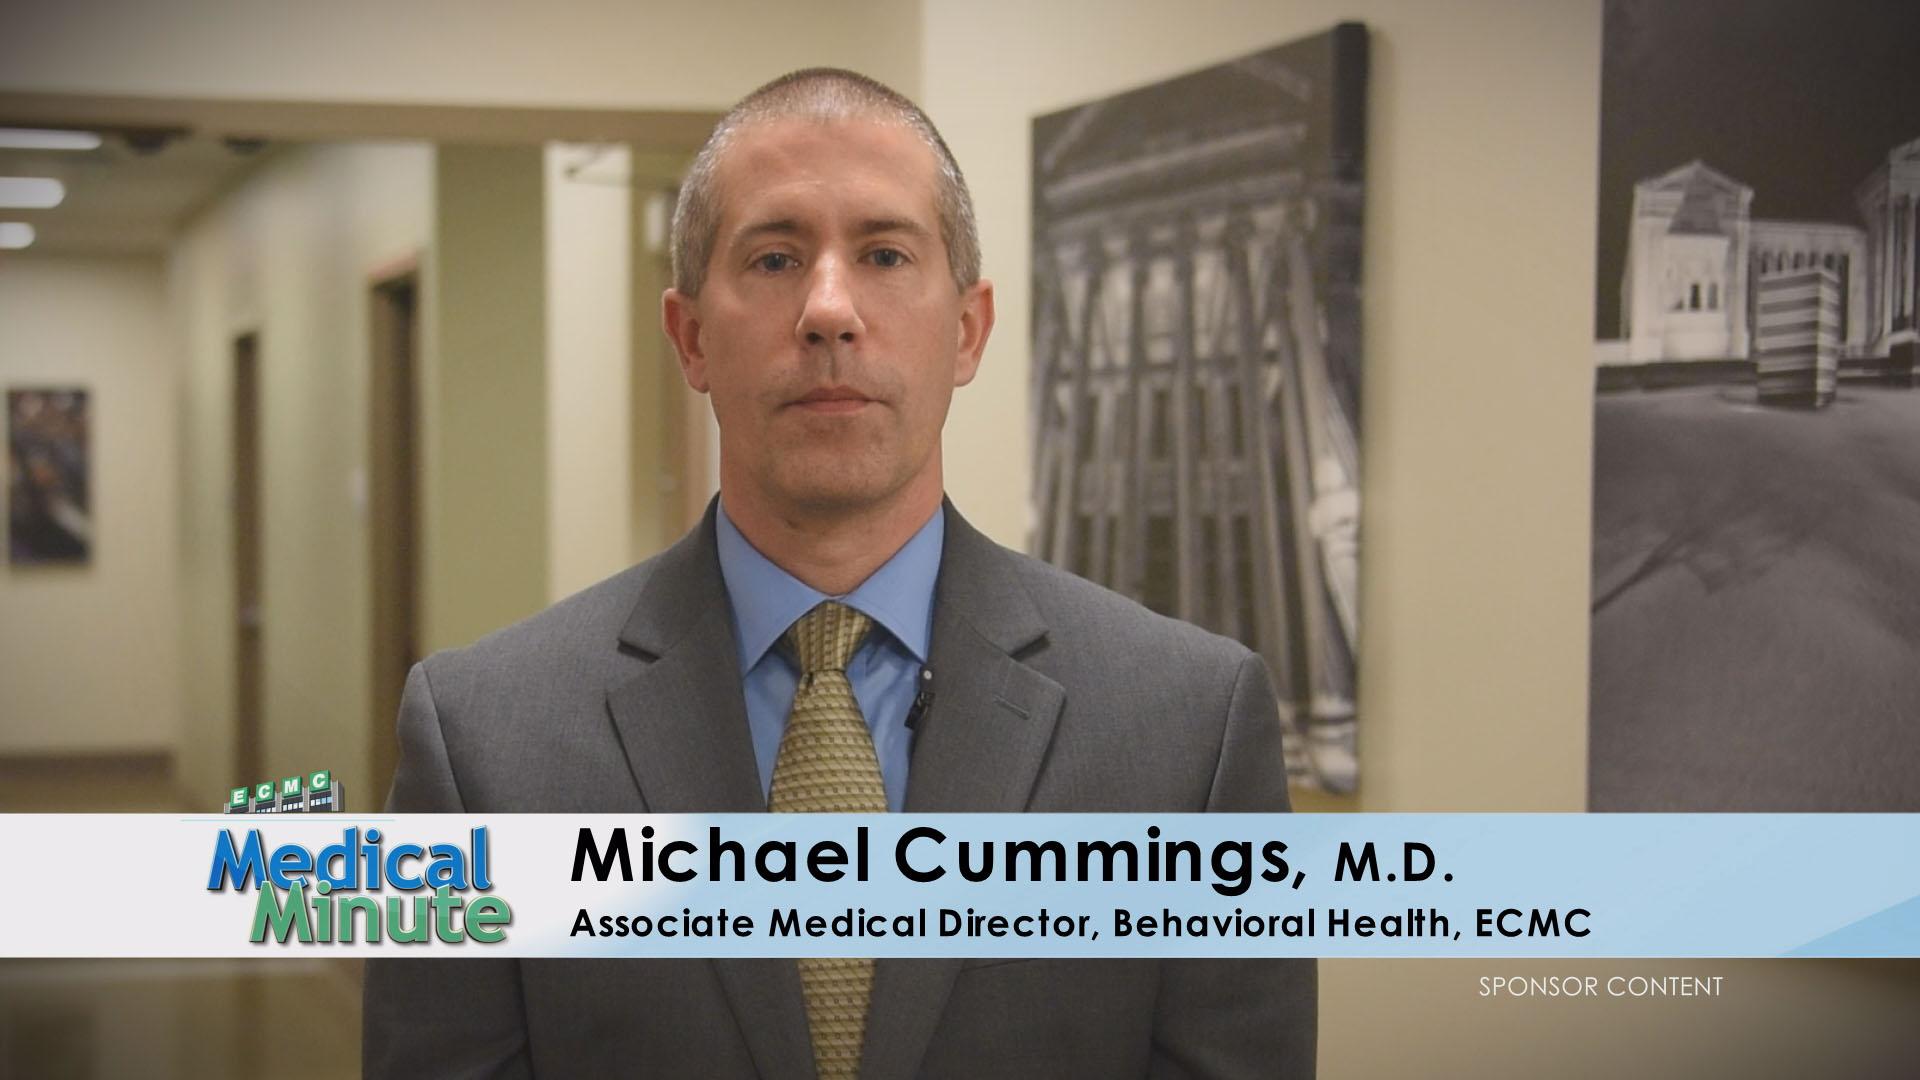 ECMC Medical Minute Dr. MikeCummings Autism 05.23.16 STILL